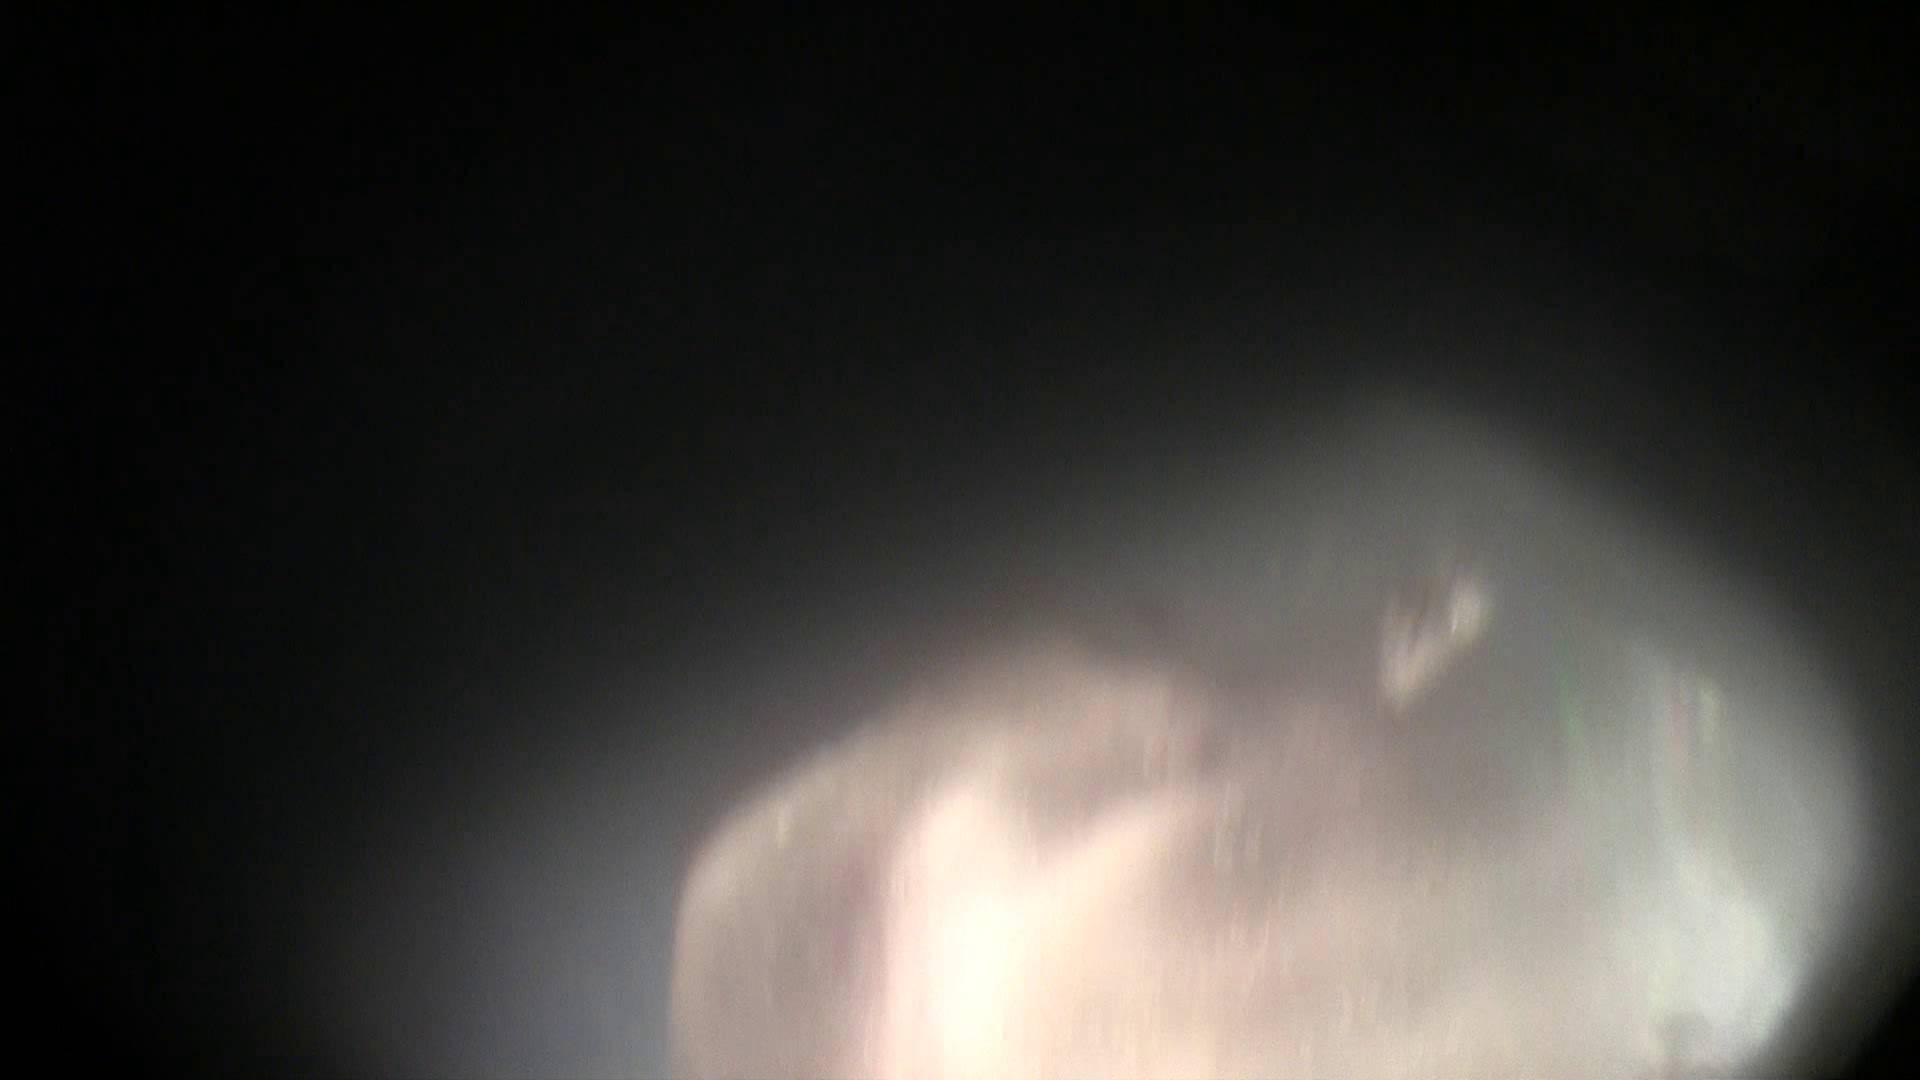 NO.11 年増の一本道!!中身ハミ出てます シャワー室 おめこ無修正動画無料 97画像 95